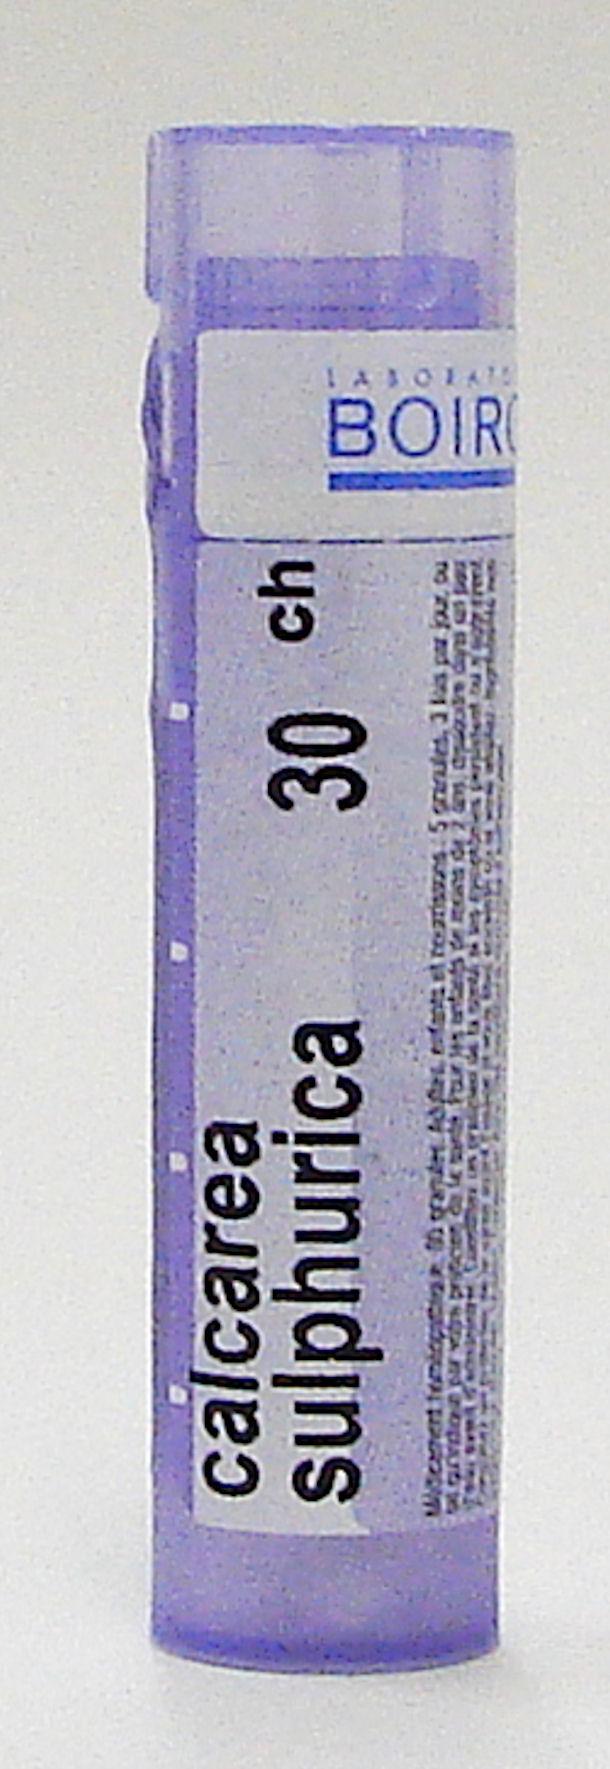 calcarea sulphurica 30ch sublingual pellets (boiron)